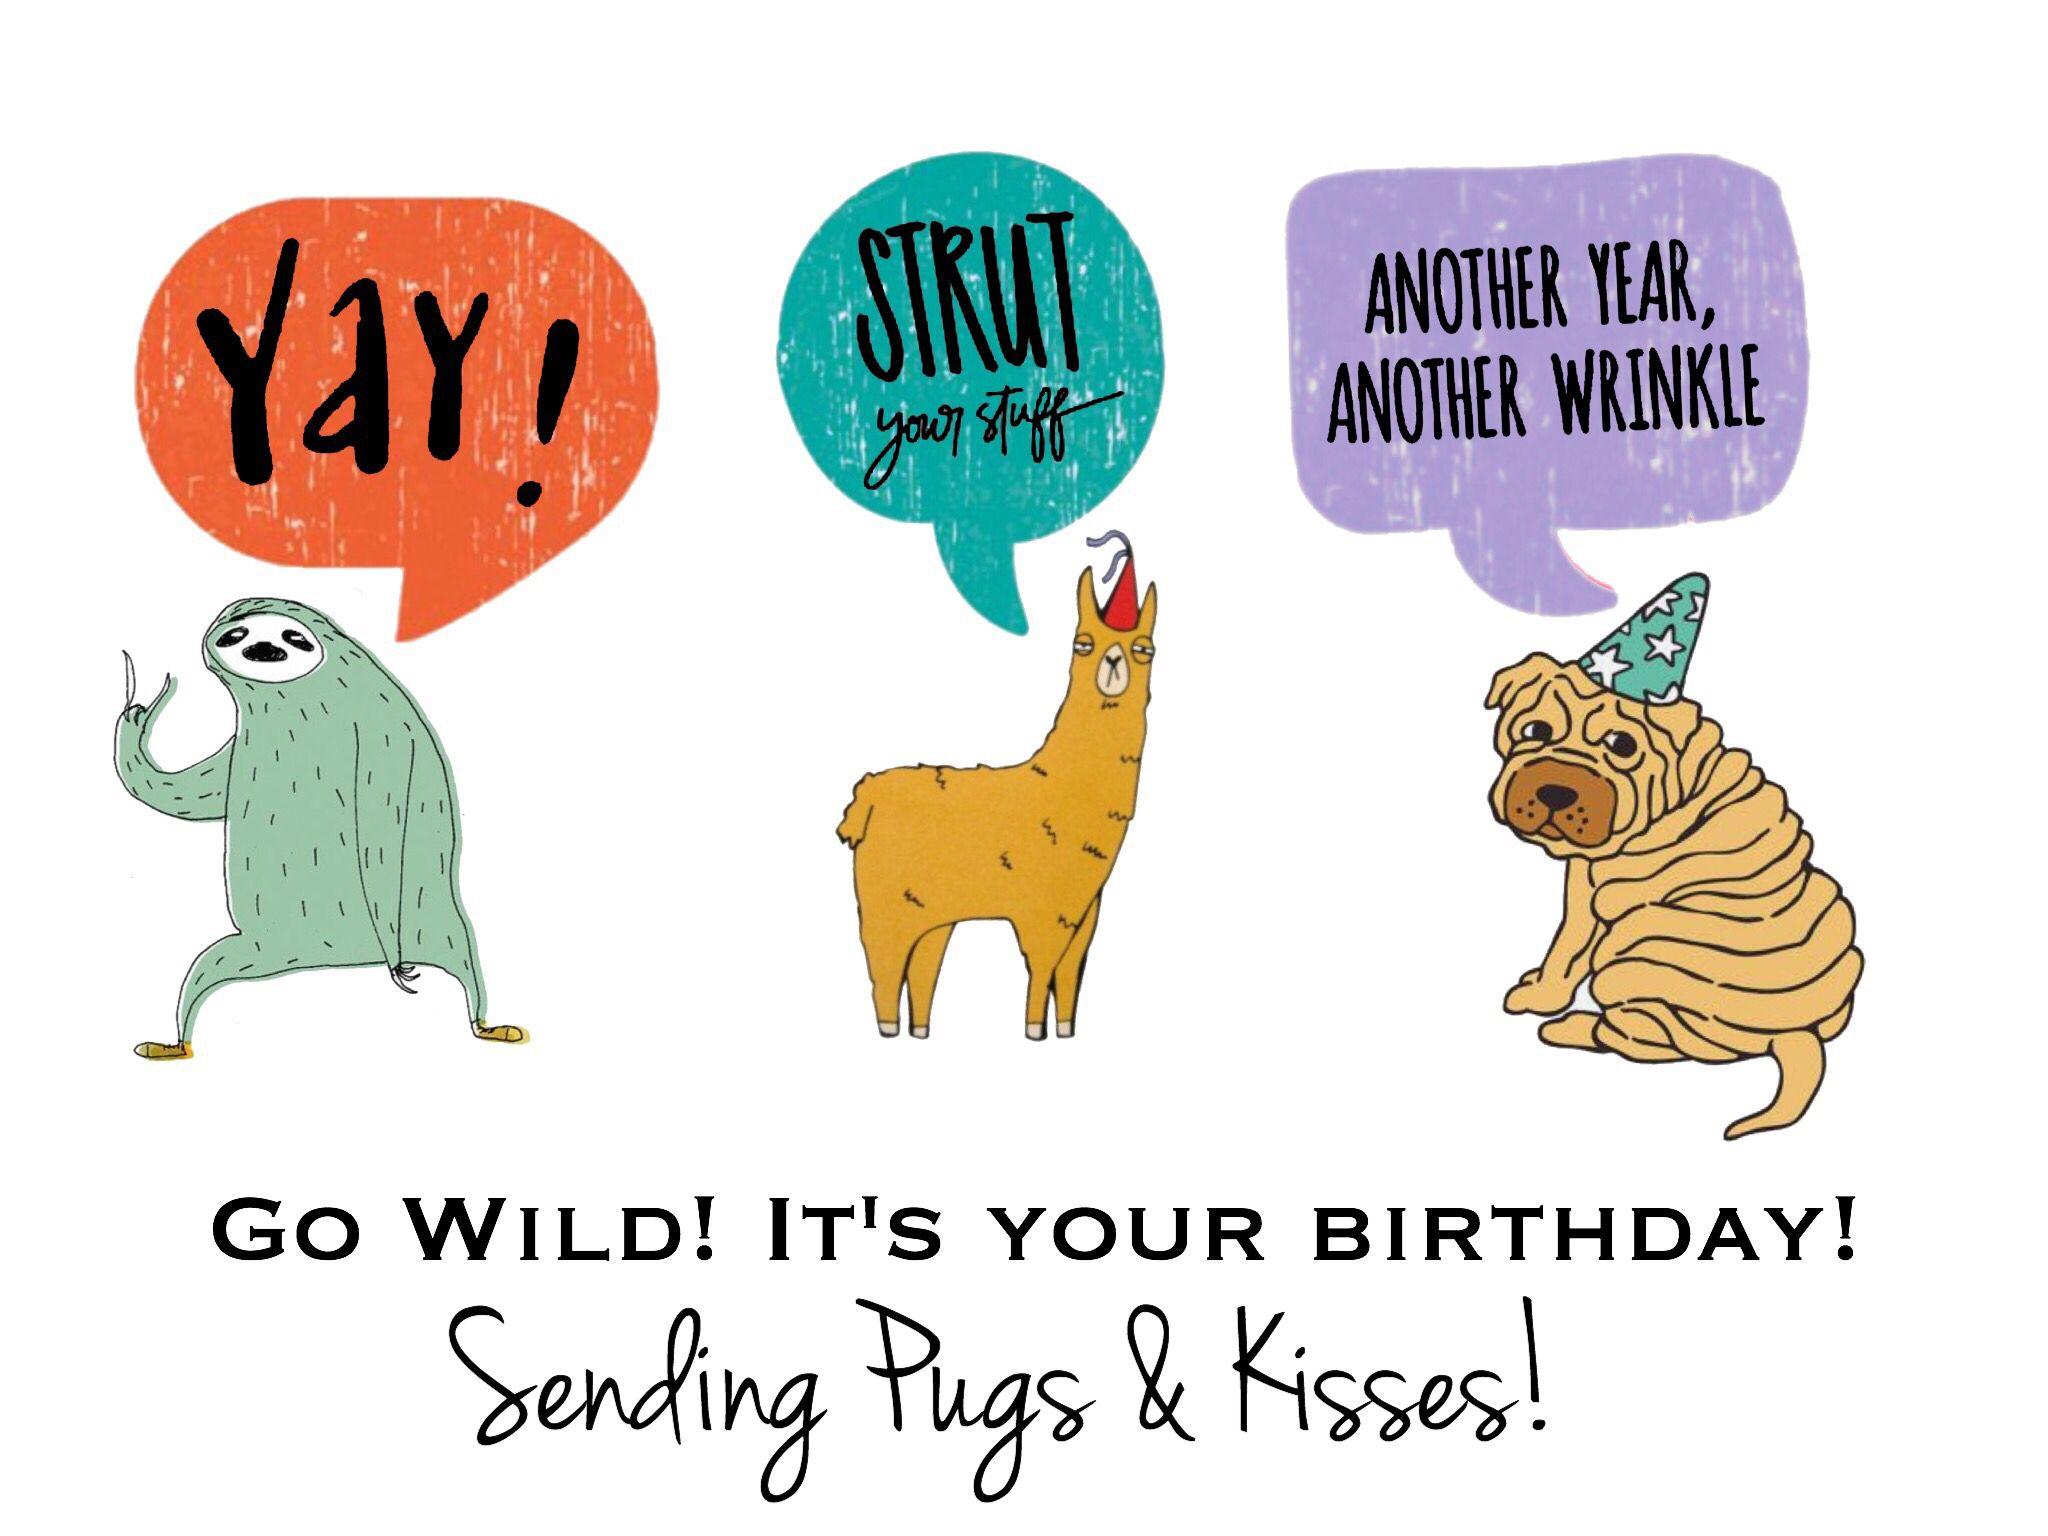 Llama Birthday Card Pug Birthday Card Sloth Birthday Card Go The